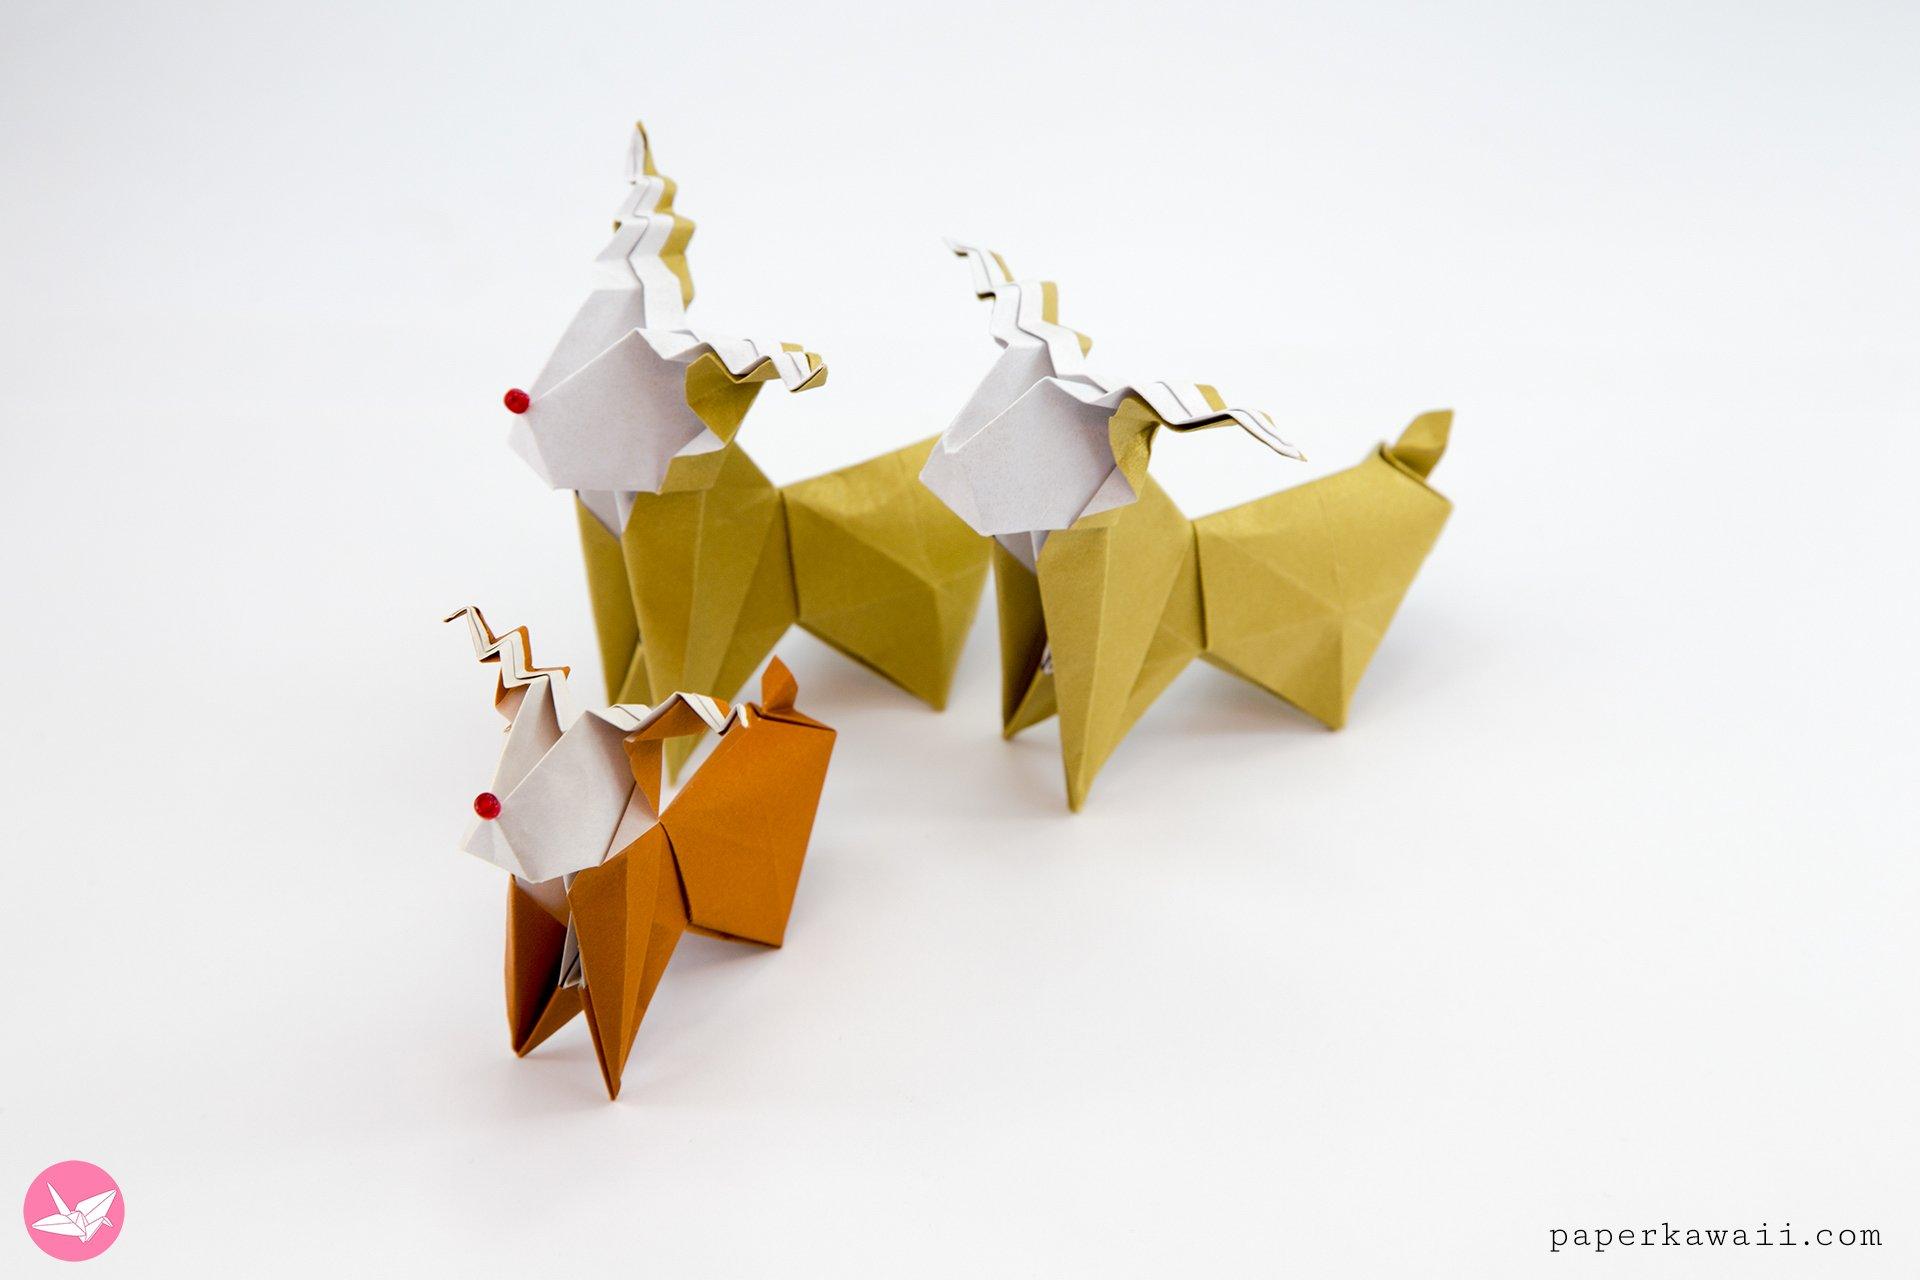 Origami Reindeer Tutorial - Make a cute paper Rudolf ... - photo#49